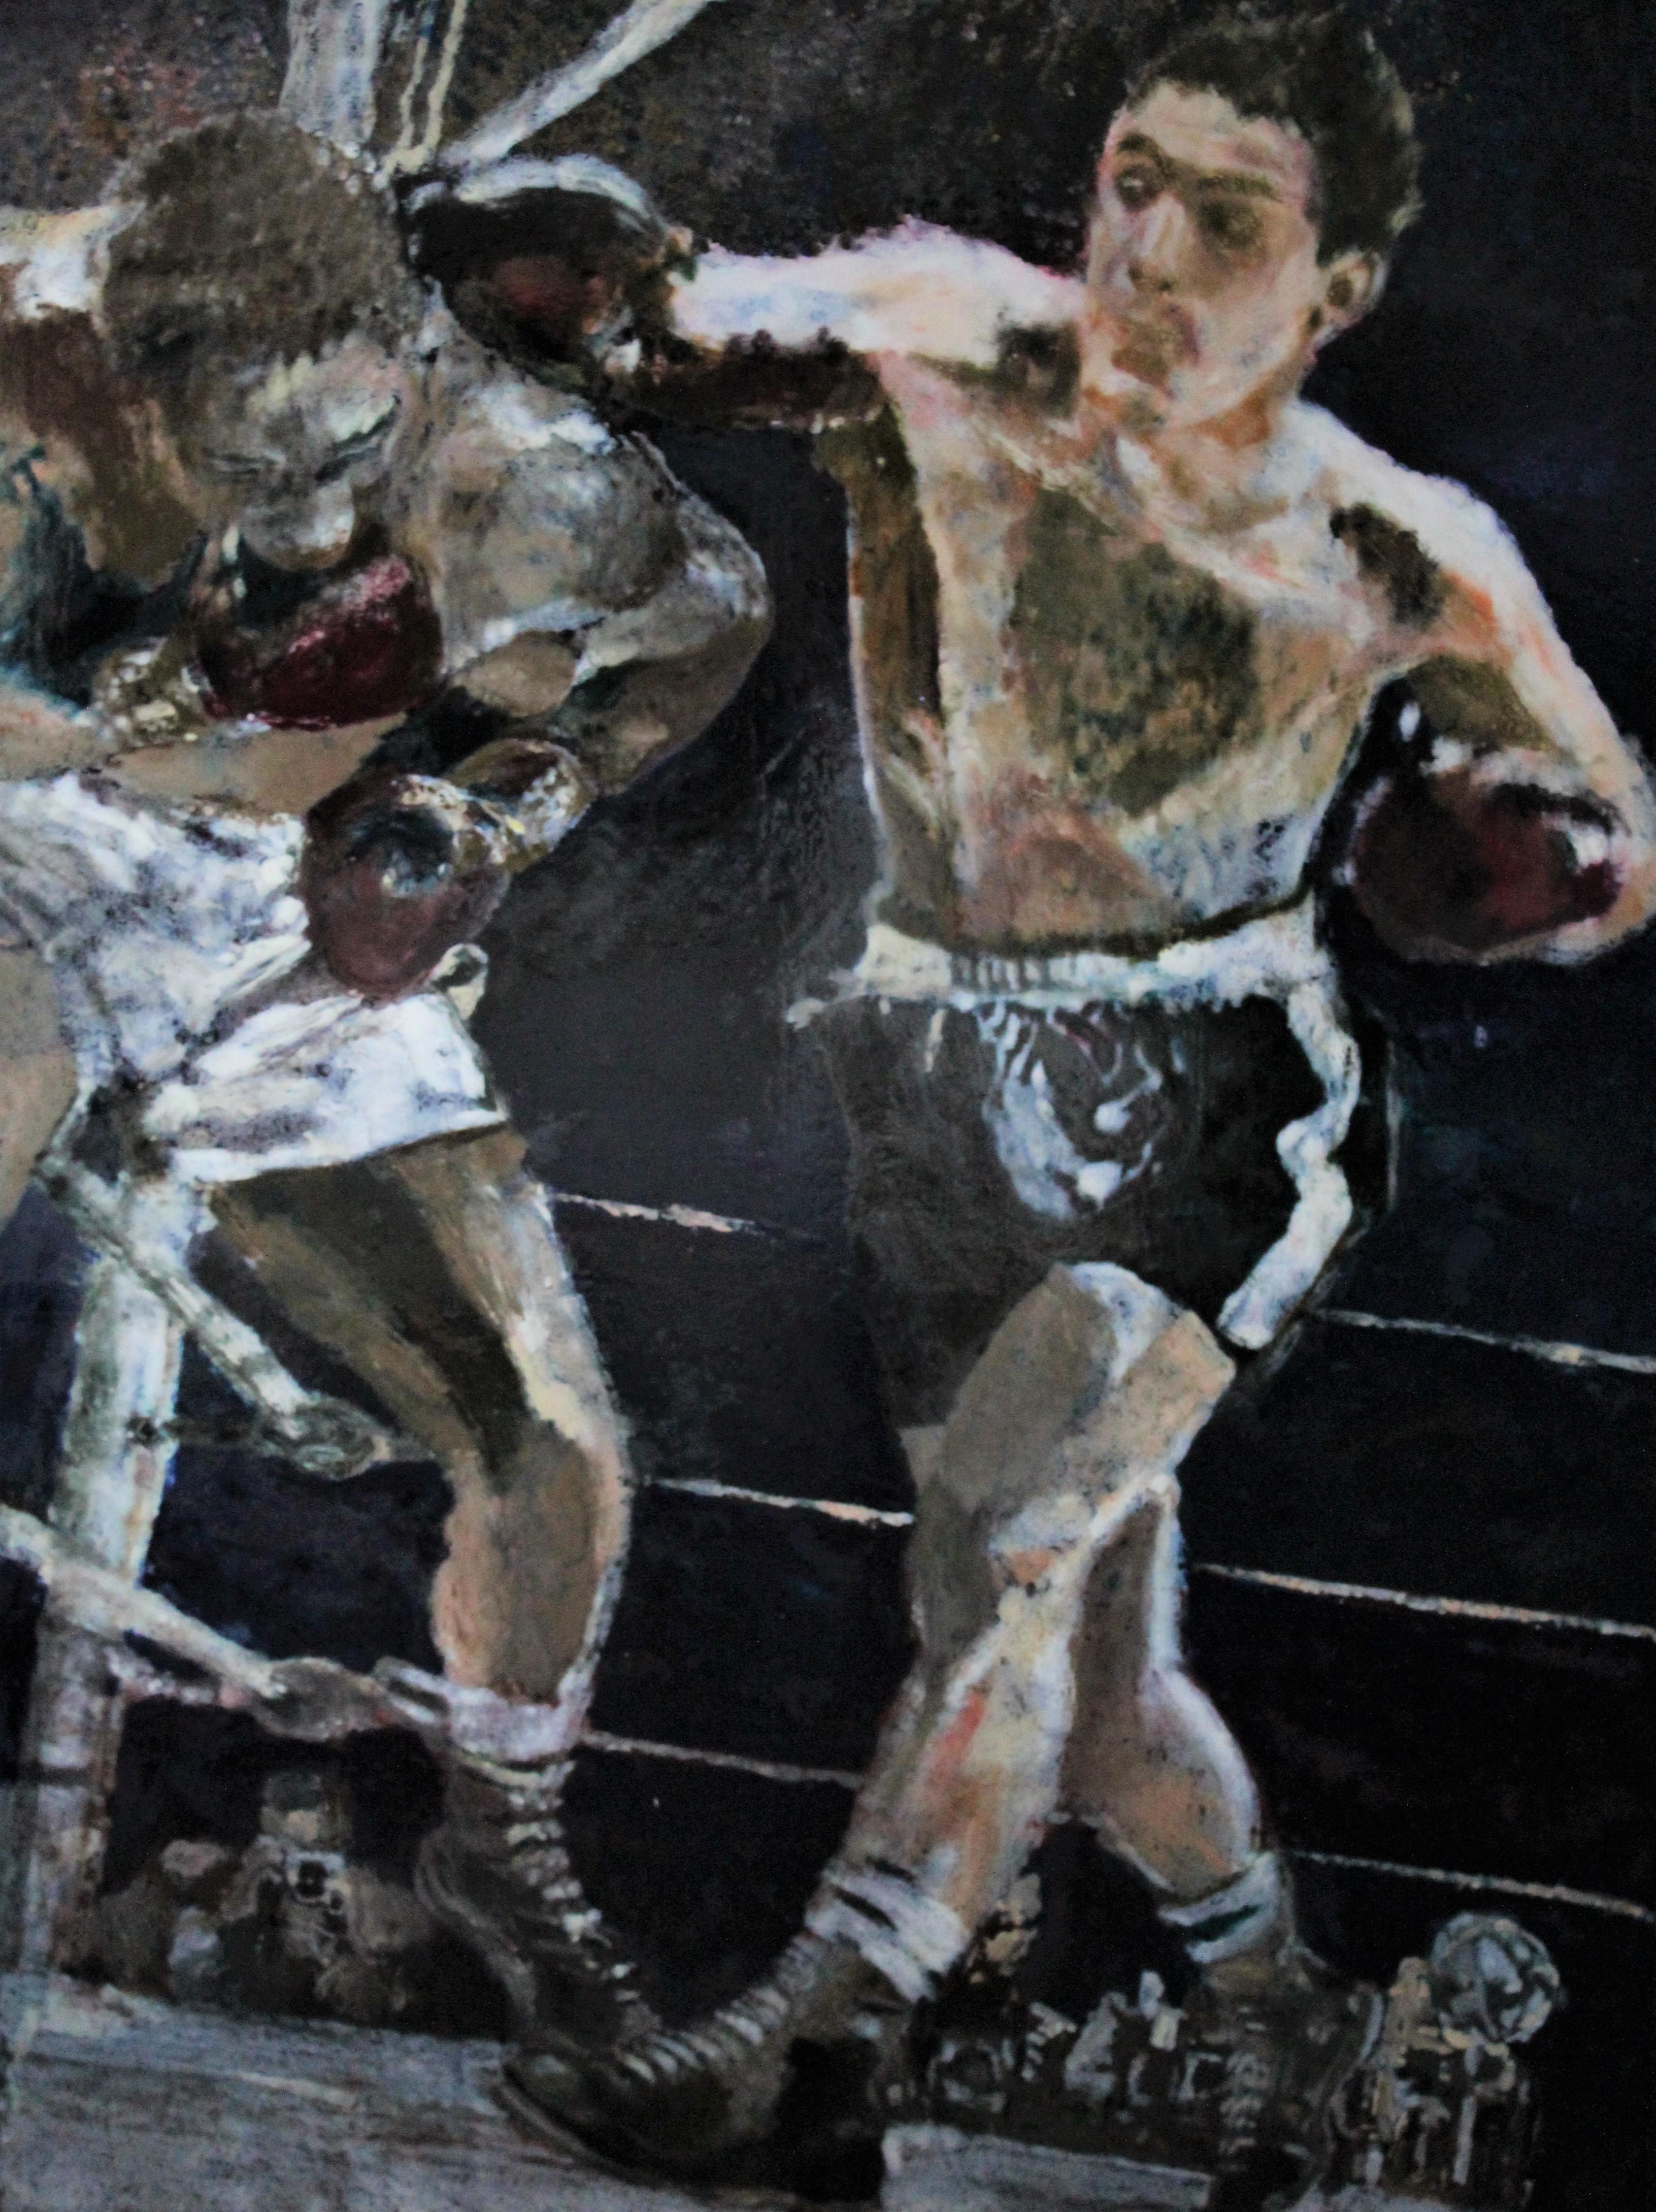 Rocky Marciano, 53-0